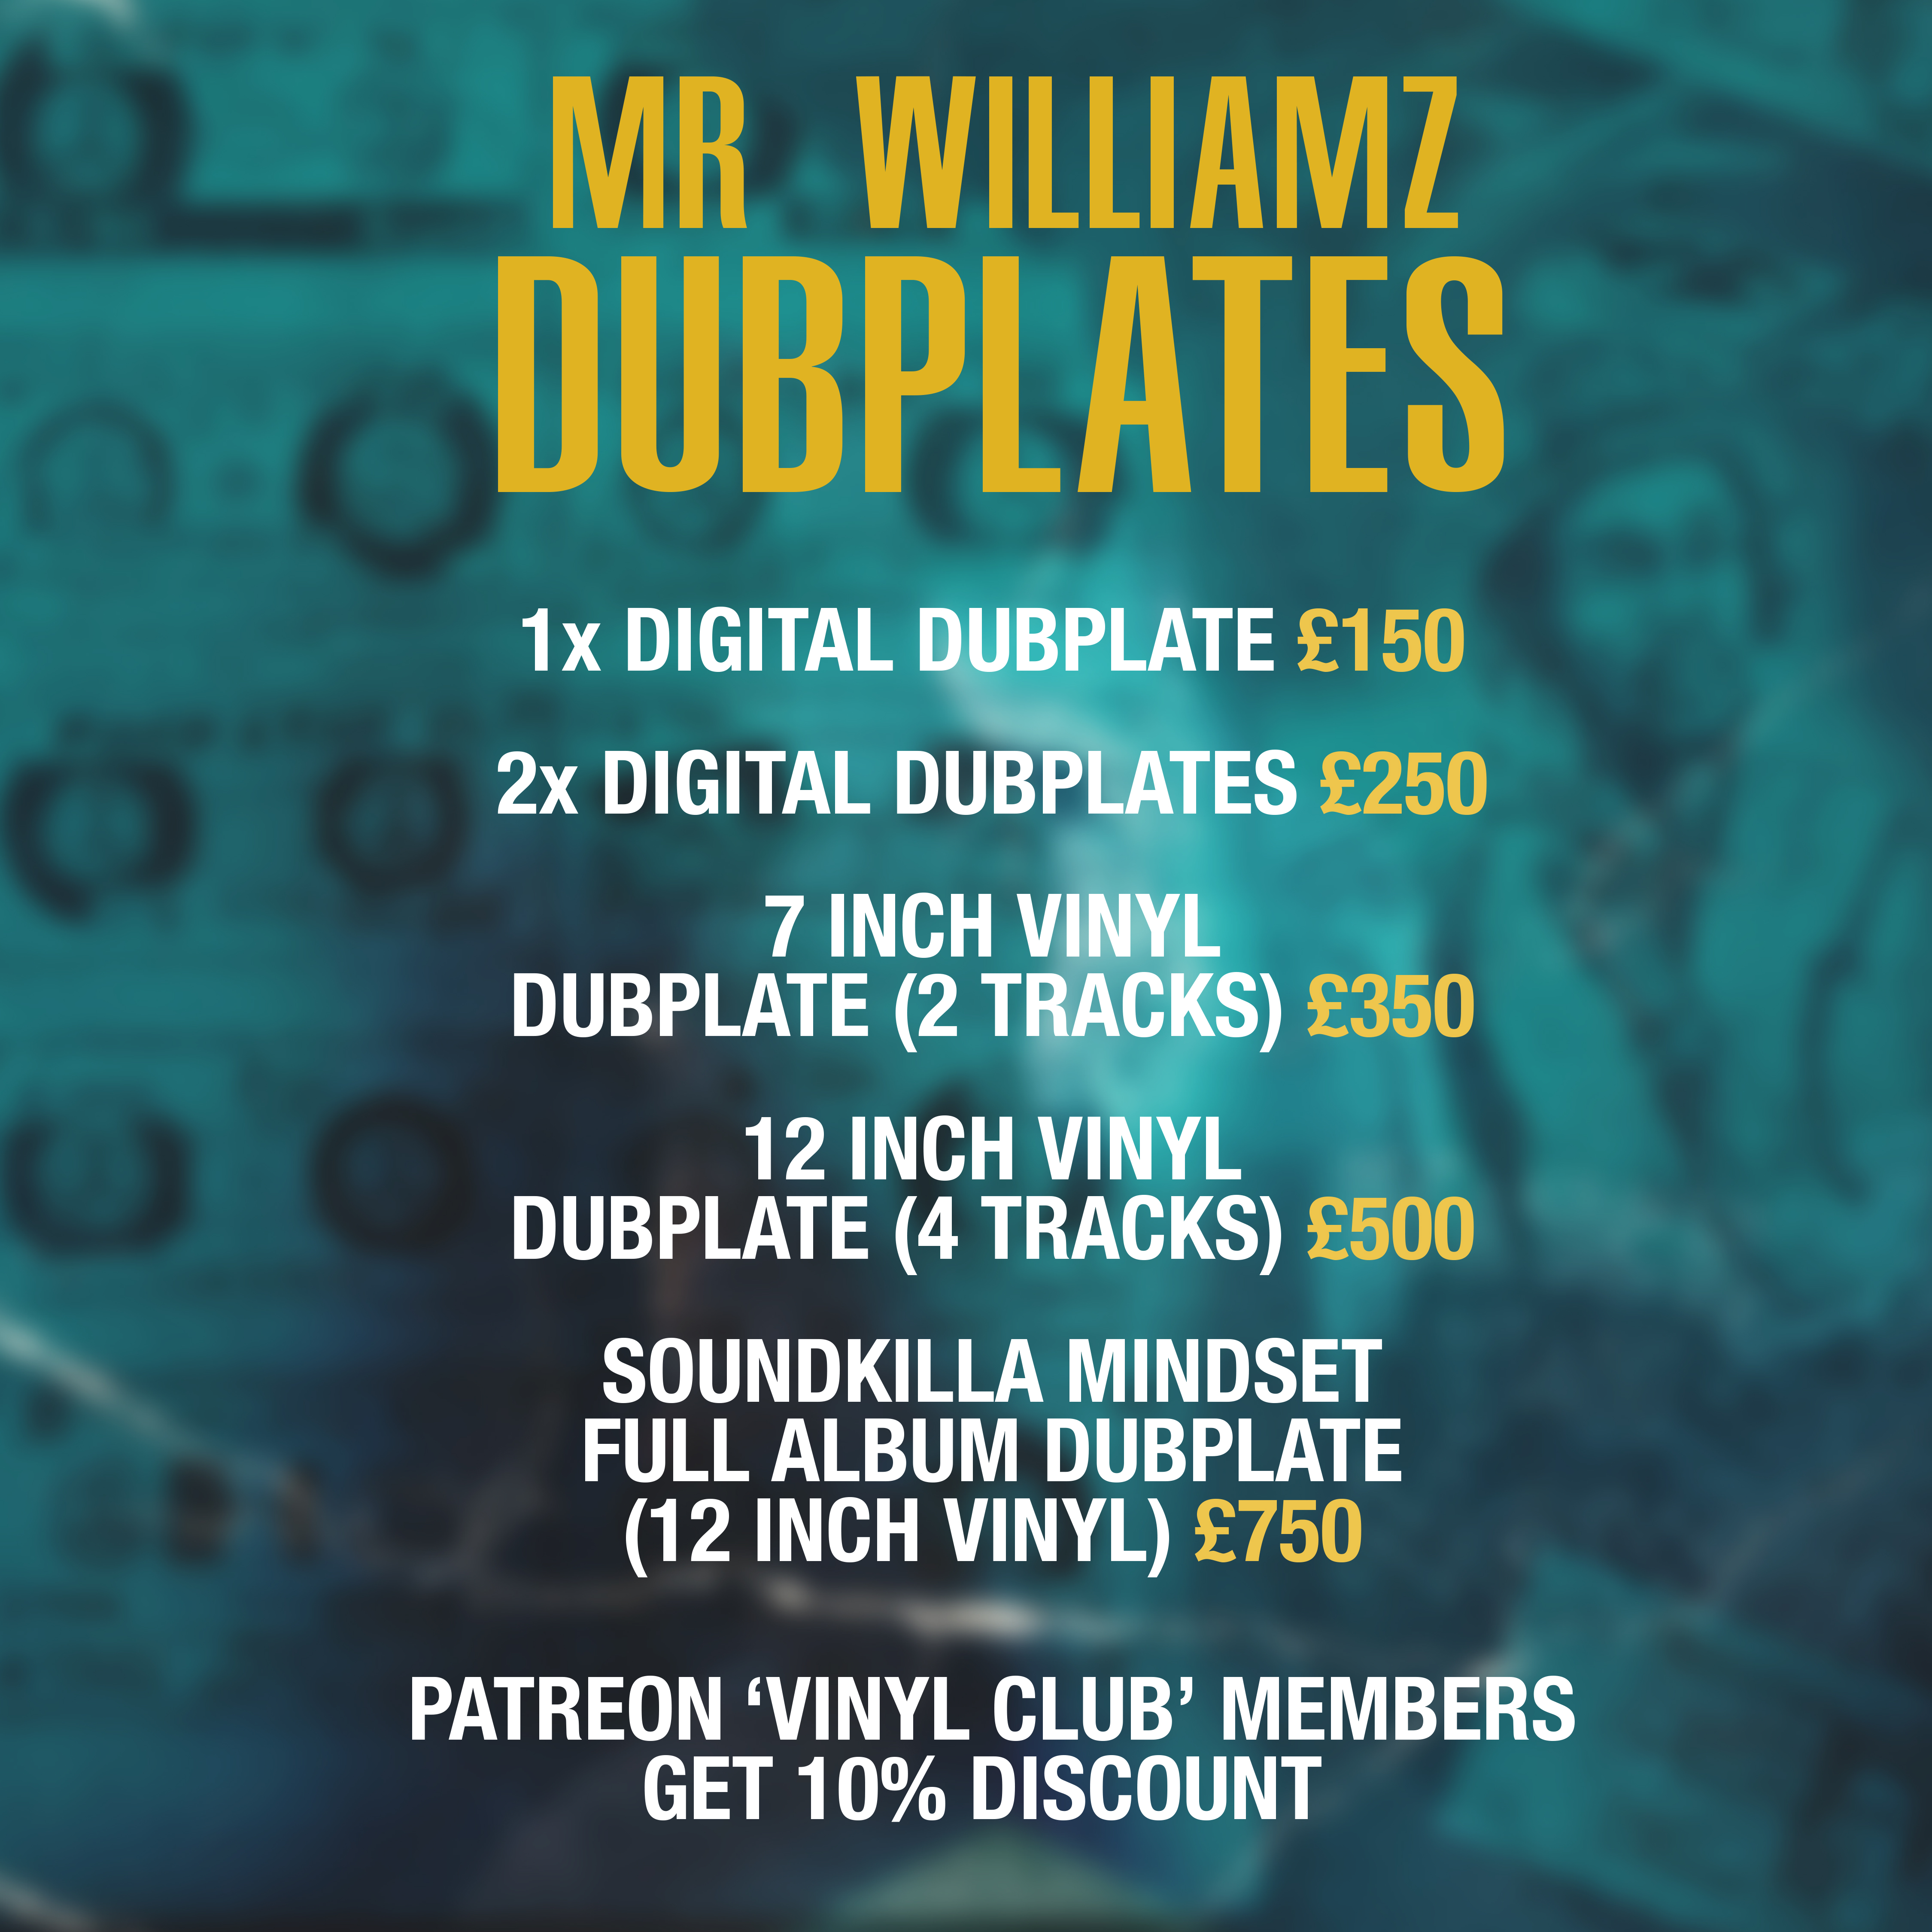 Dubplate price list